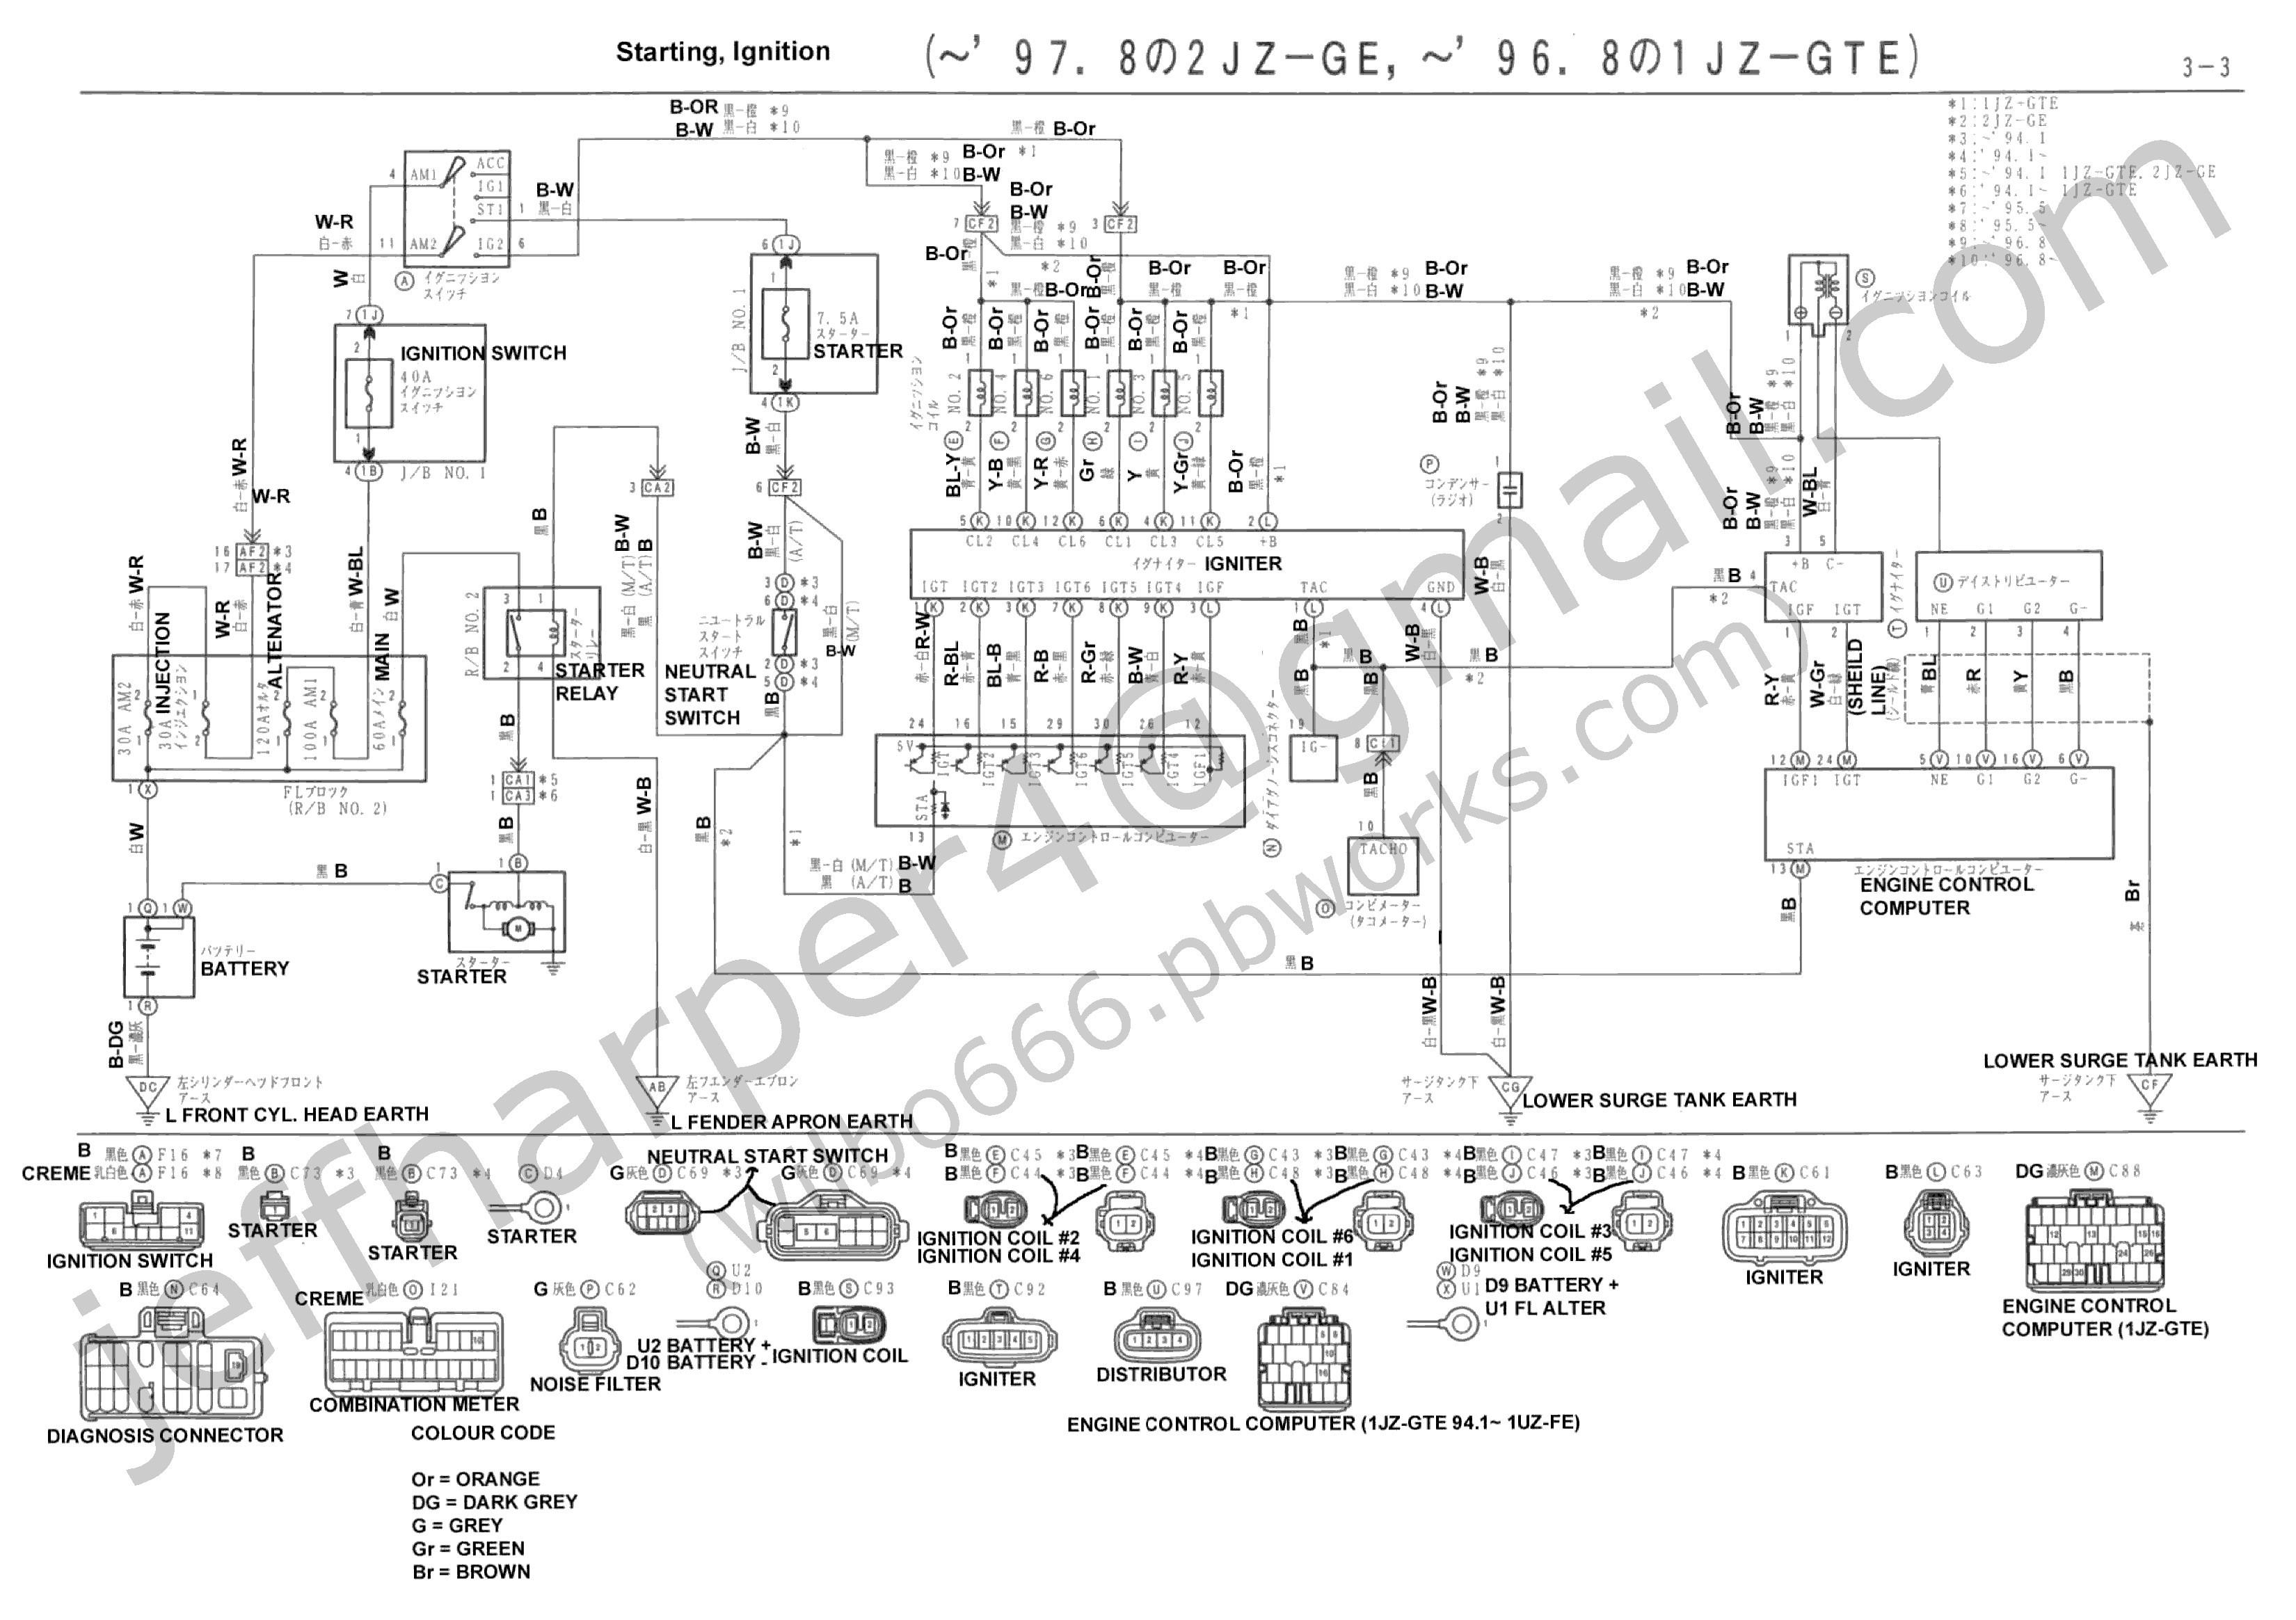 1jz Engine Wiring Diagram Wiring Diagram Alternator Warning Light Save Wilbo666 1jz Gte Jzz30 Of 1jz Engine Wiring Diagram